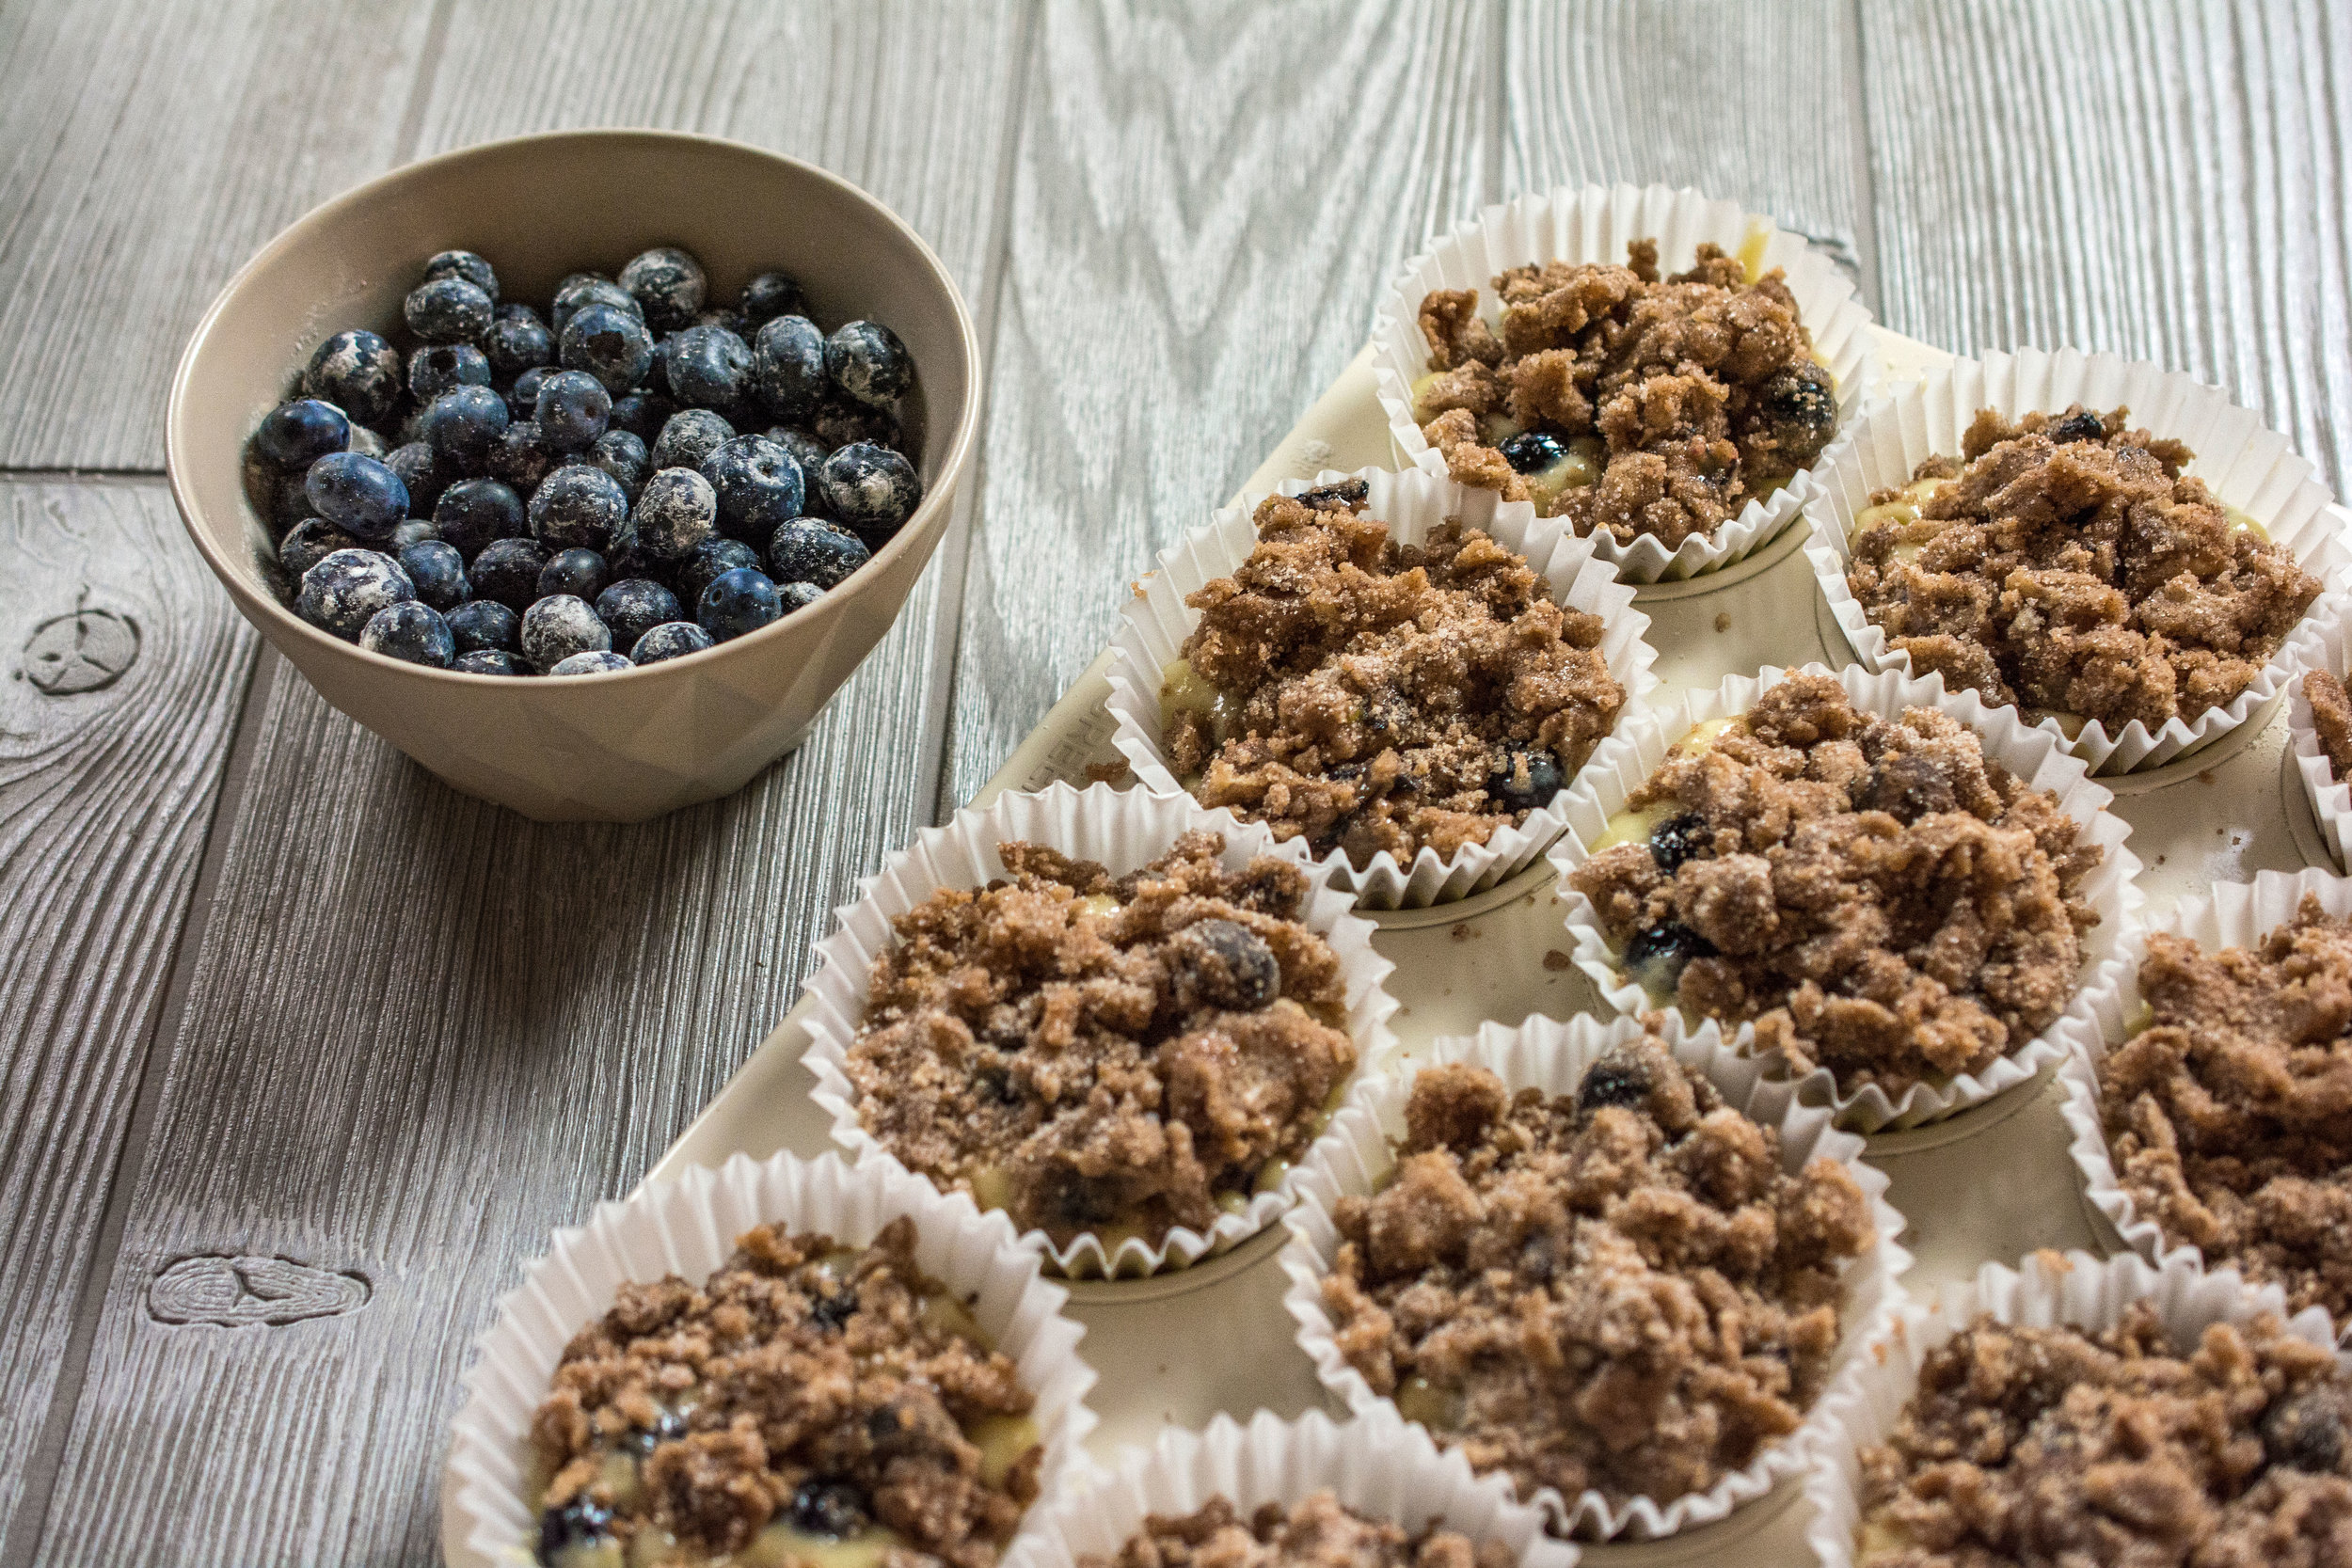 Blueberry_Muffins2_Web.jpg